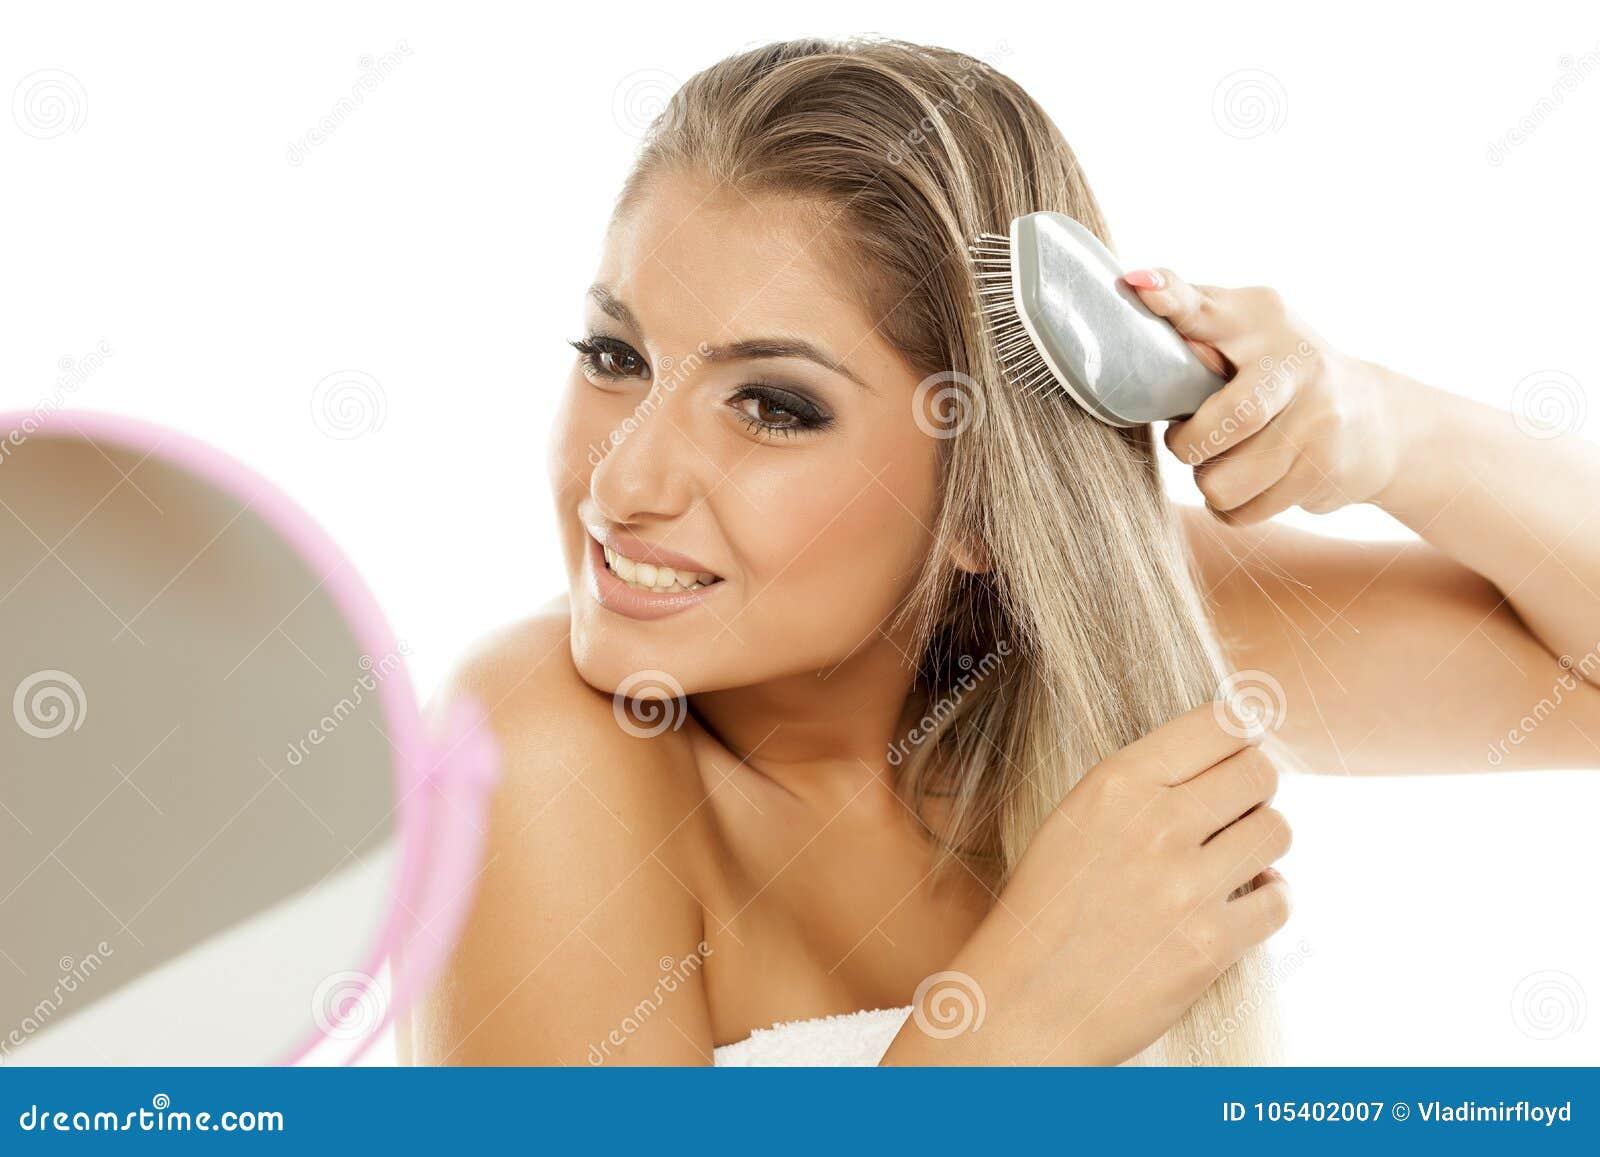 Download βουρτσίζοντας το τρίχωμα η γυναίκα της Στοκ Εικόνα - εικόνα από χτένα, καυκάσιος: 105402007